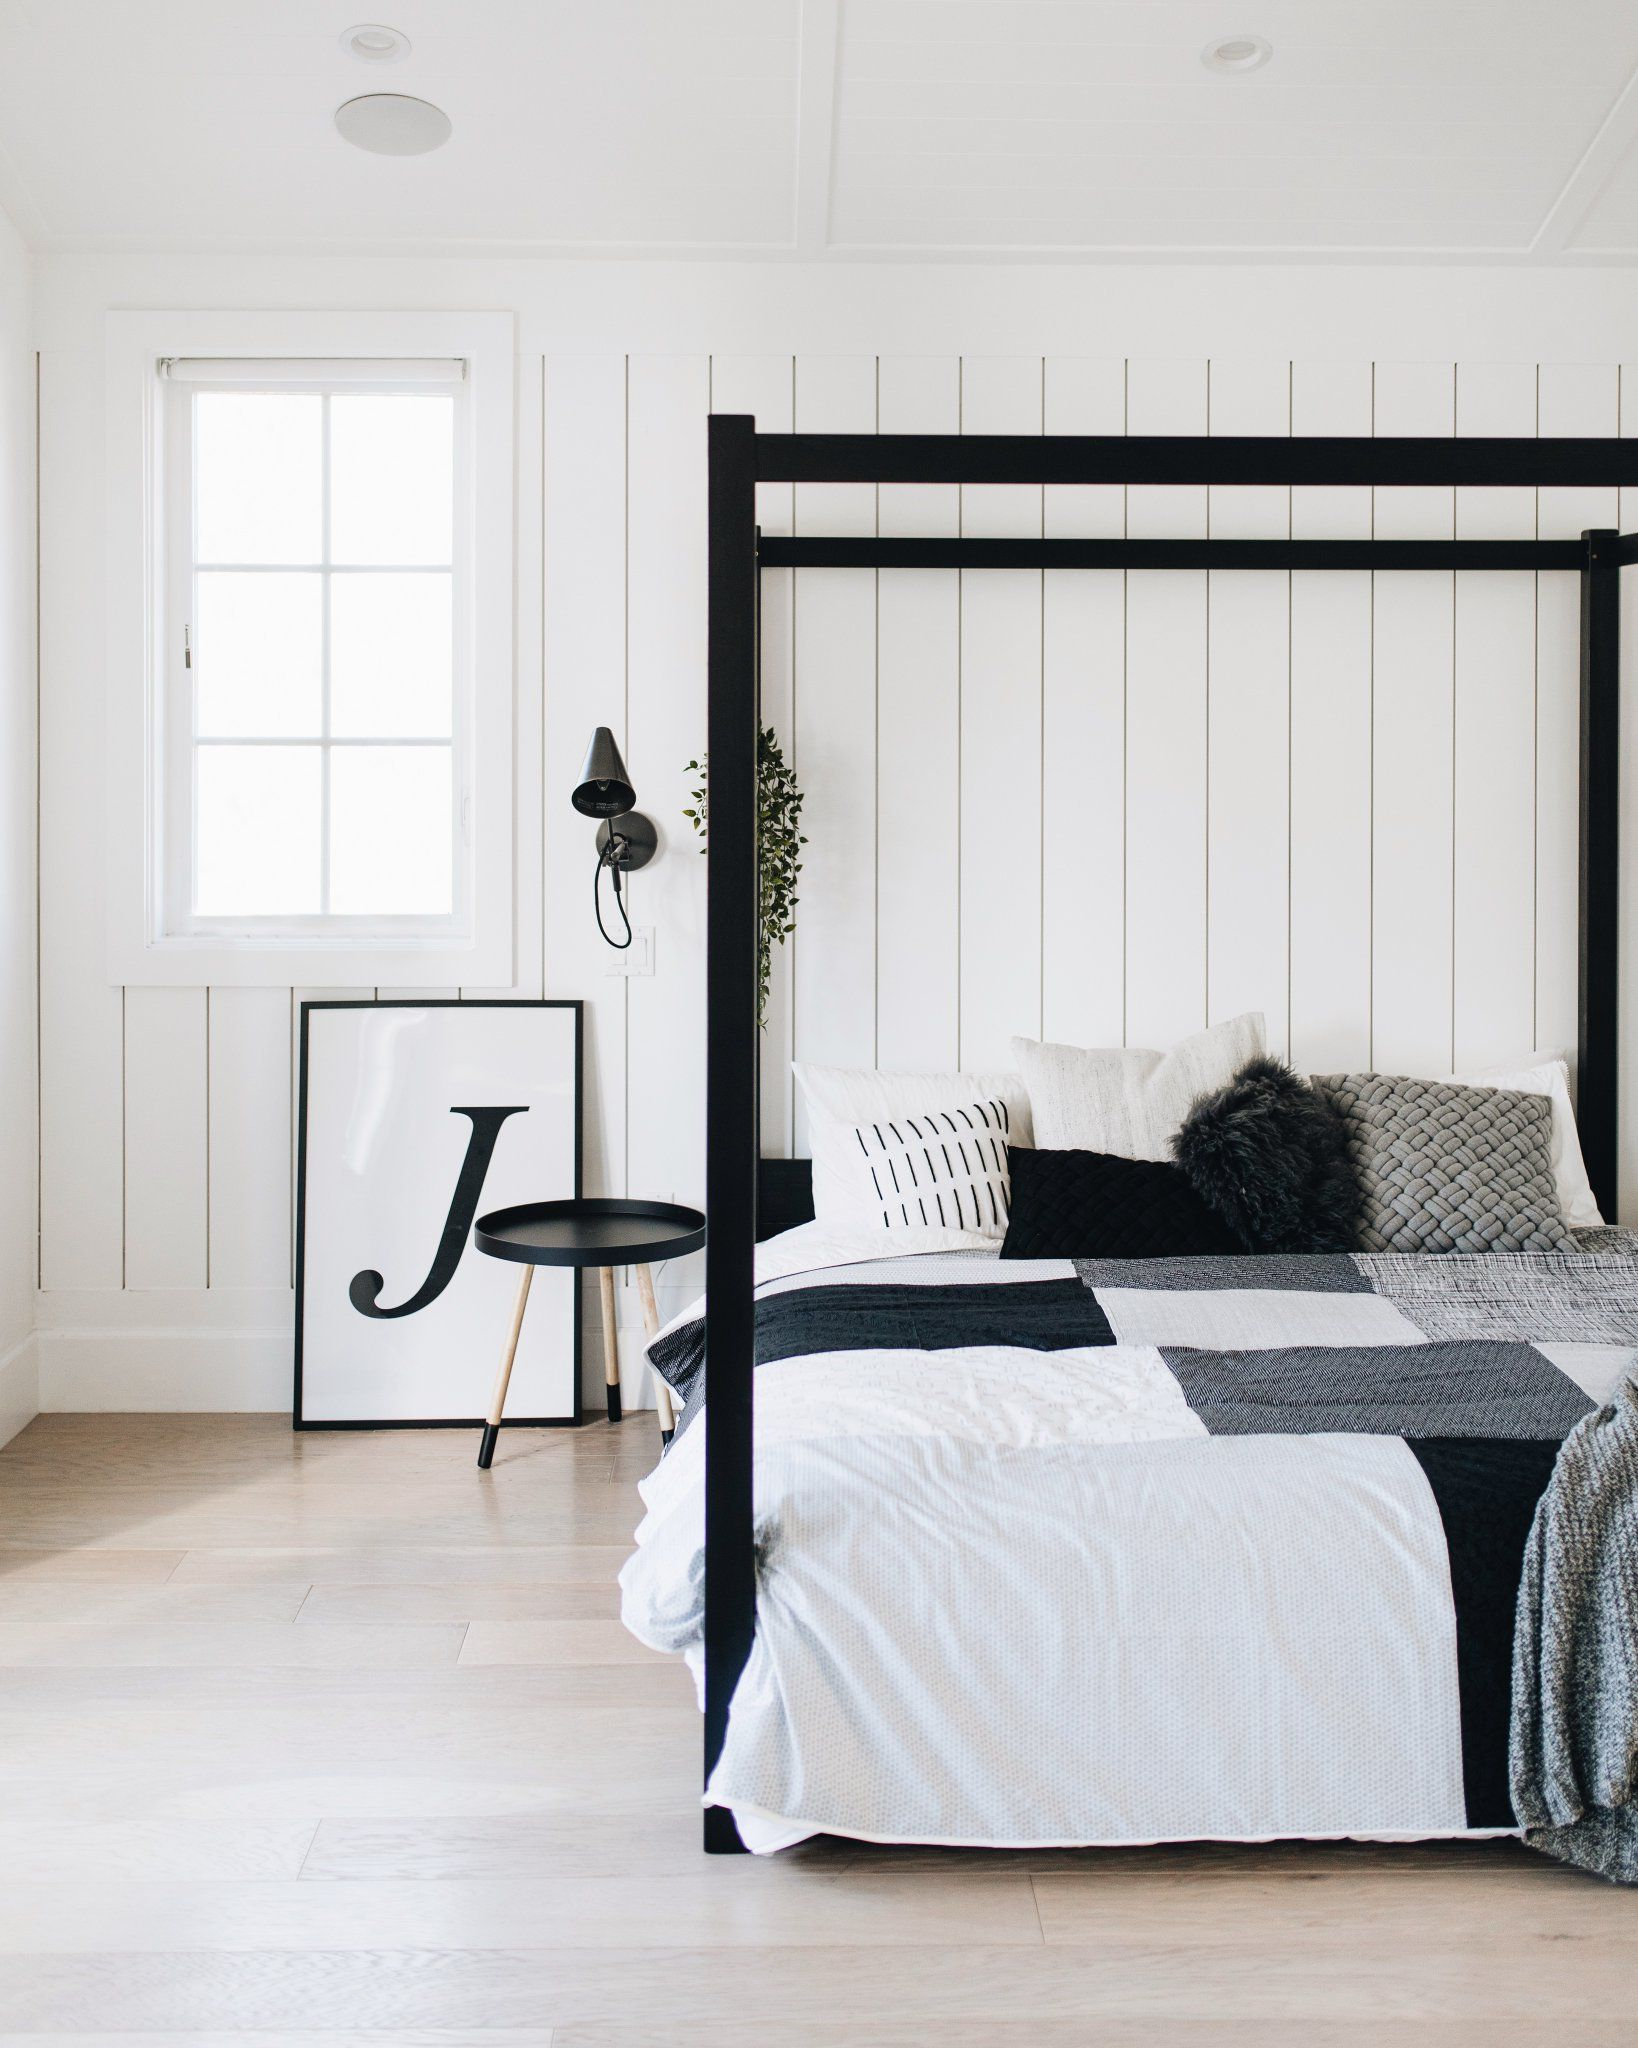 Pin by remi demetreu on bedroom decor Dream house decor